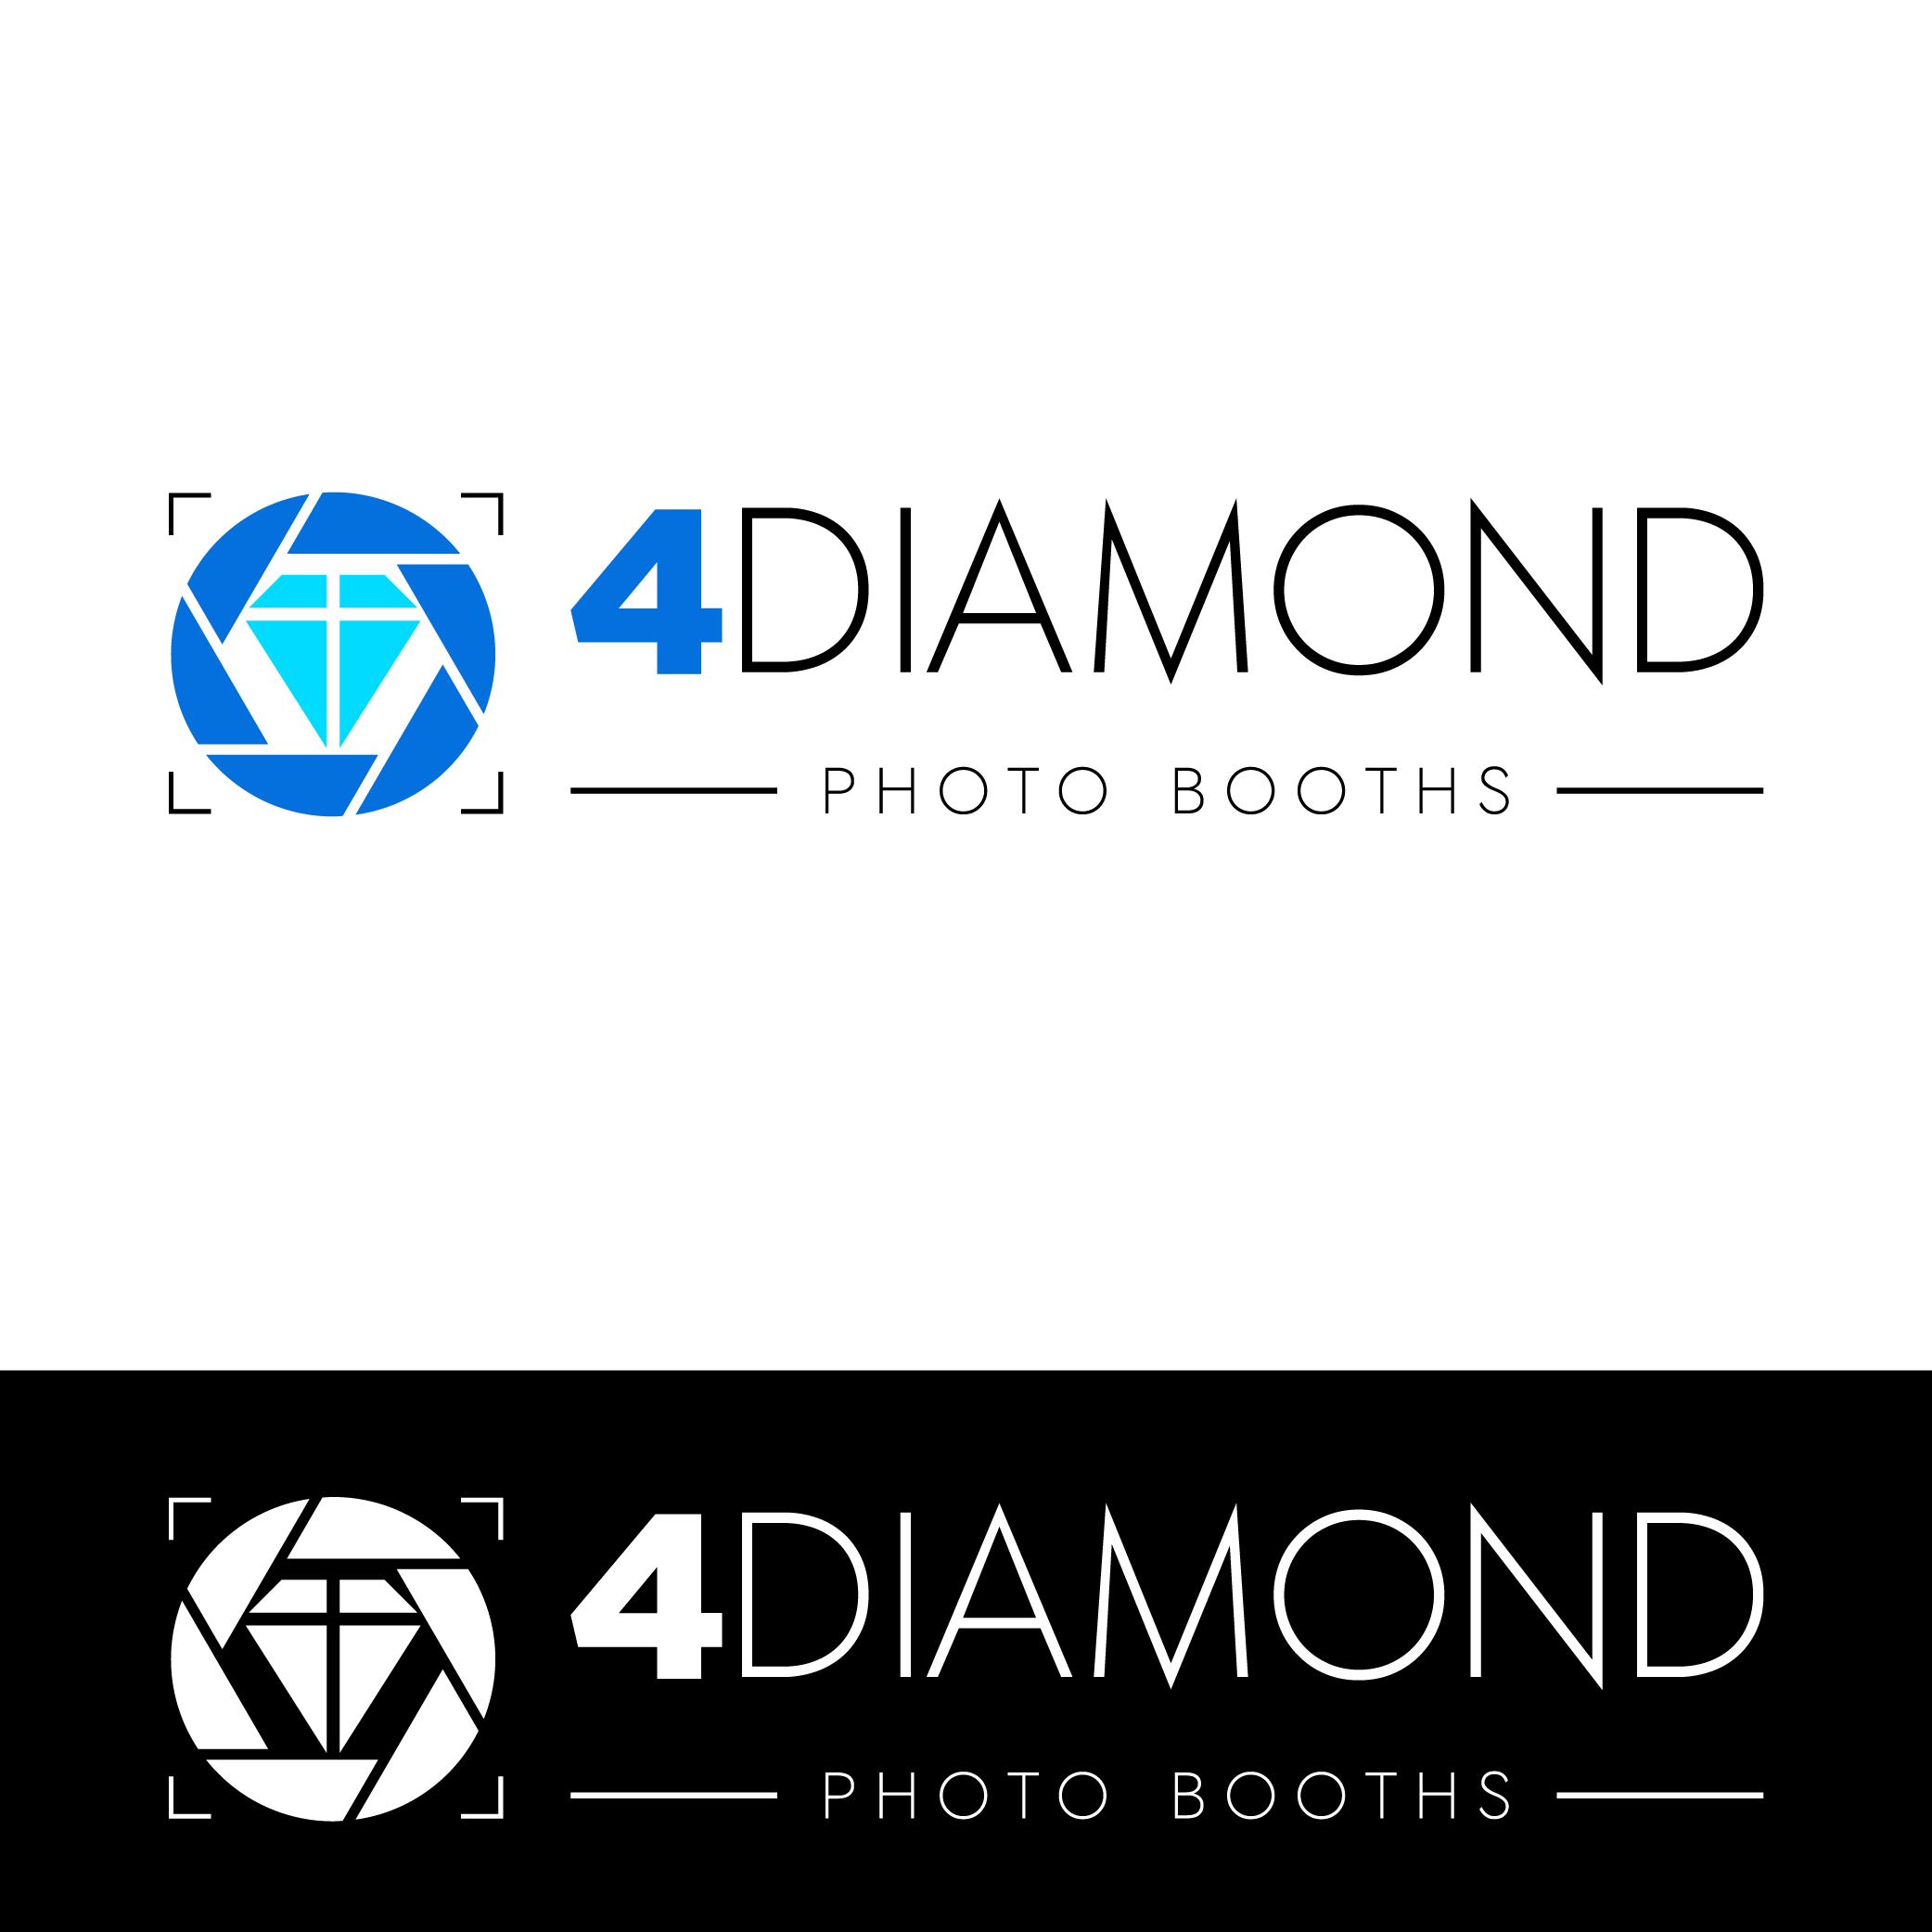 Logo Design by Private User - Entry No. 12 in the Logo Design Contest Creative Logo Design for 4 Diamond Photo Booths.